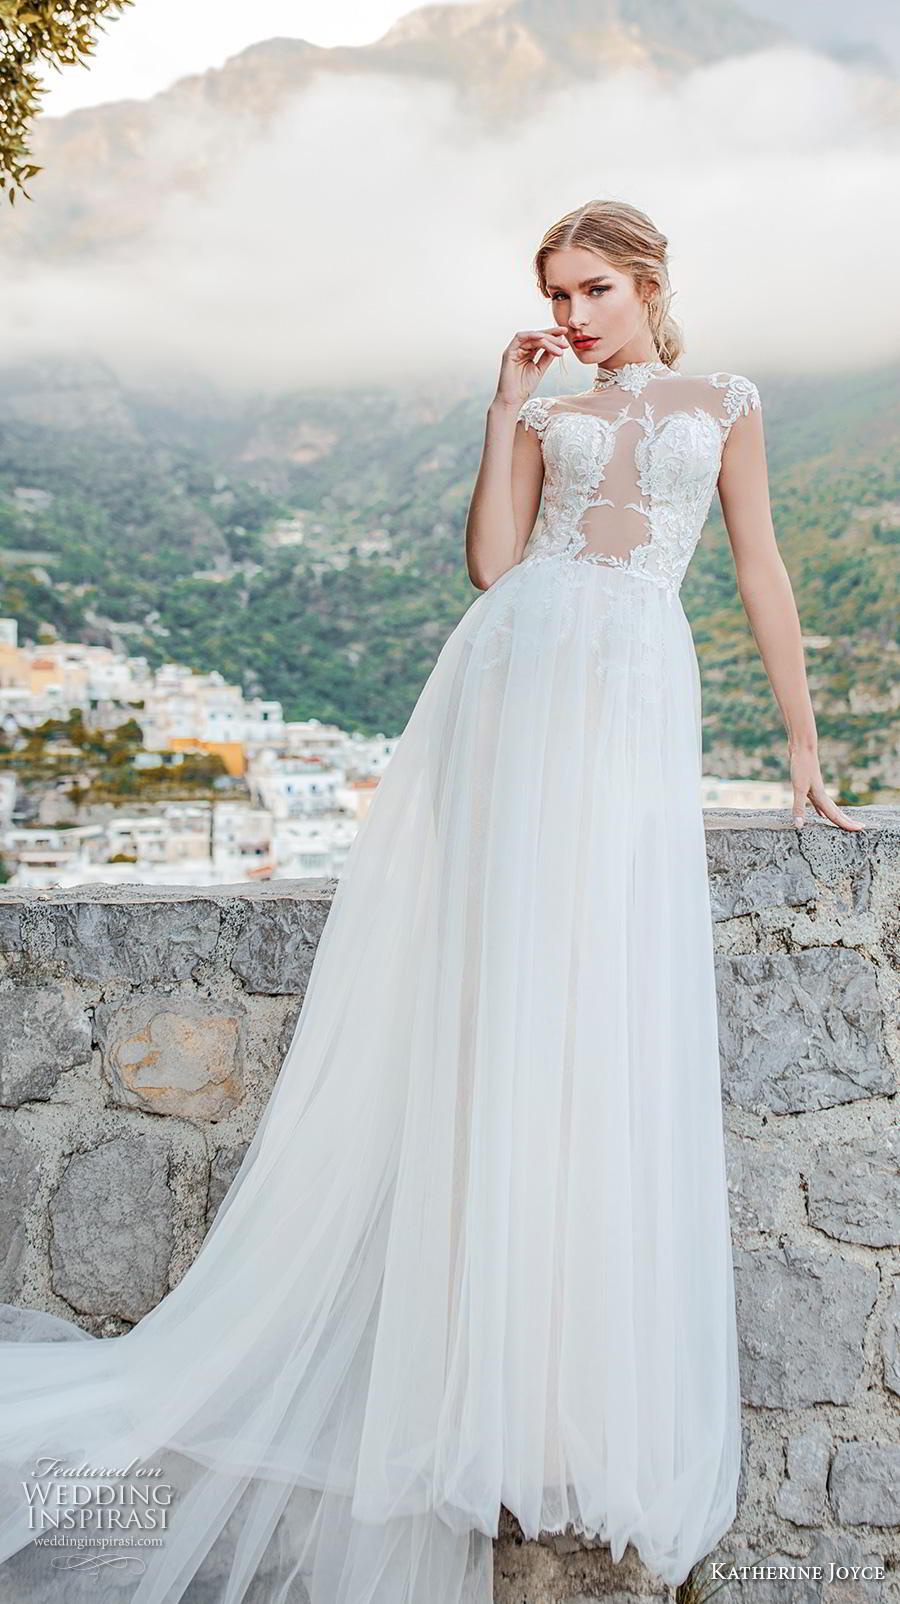 katherine joyce 2019 bridal cap sleeves illusion high neck heavily embellished bodice glamorous romantic a  line wedding dress sheer button back chapel train (8) mv